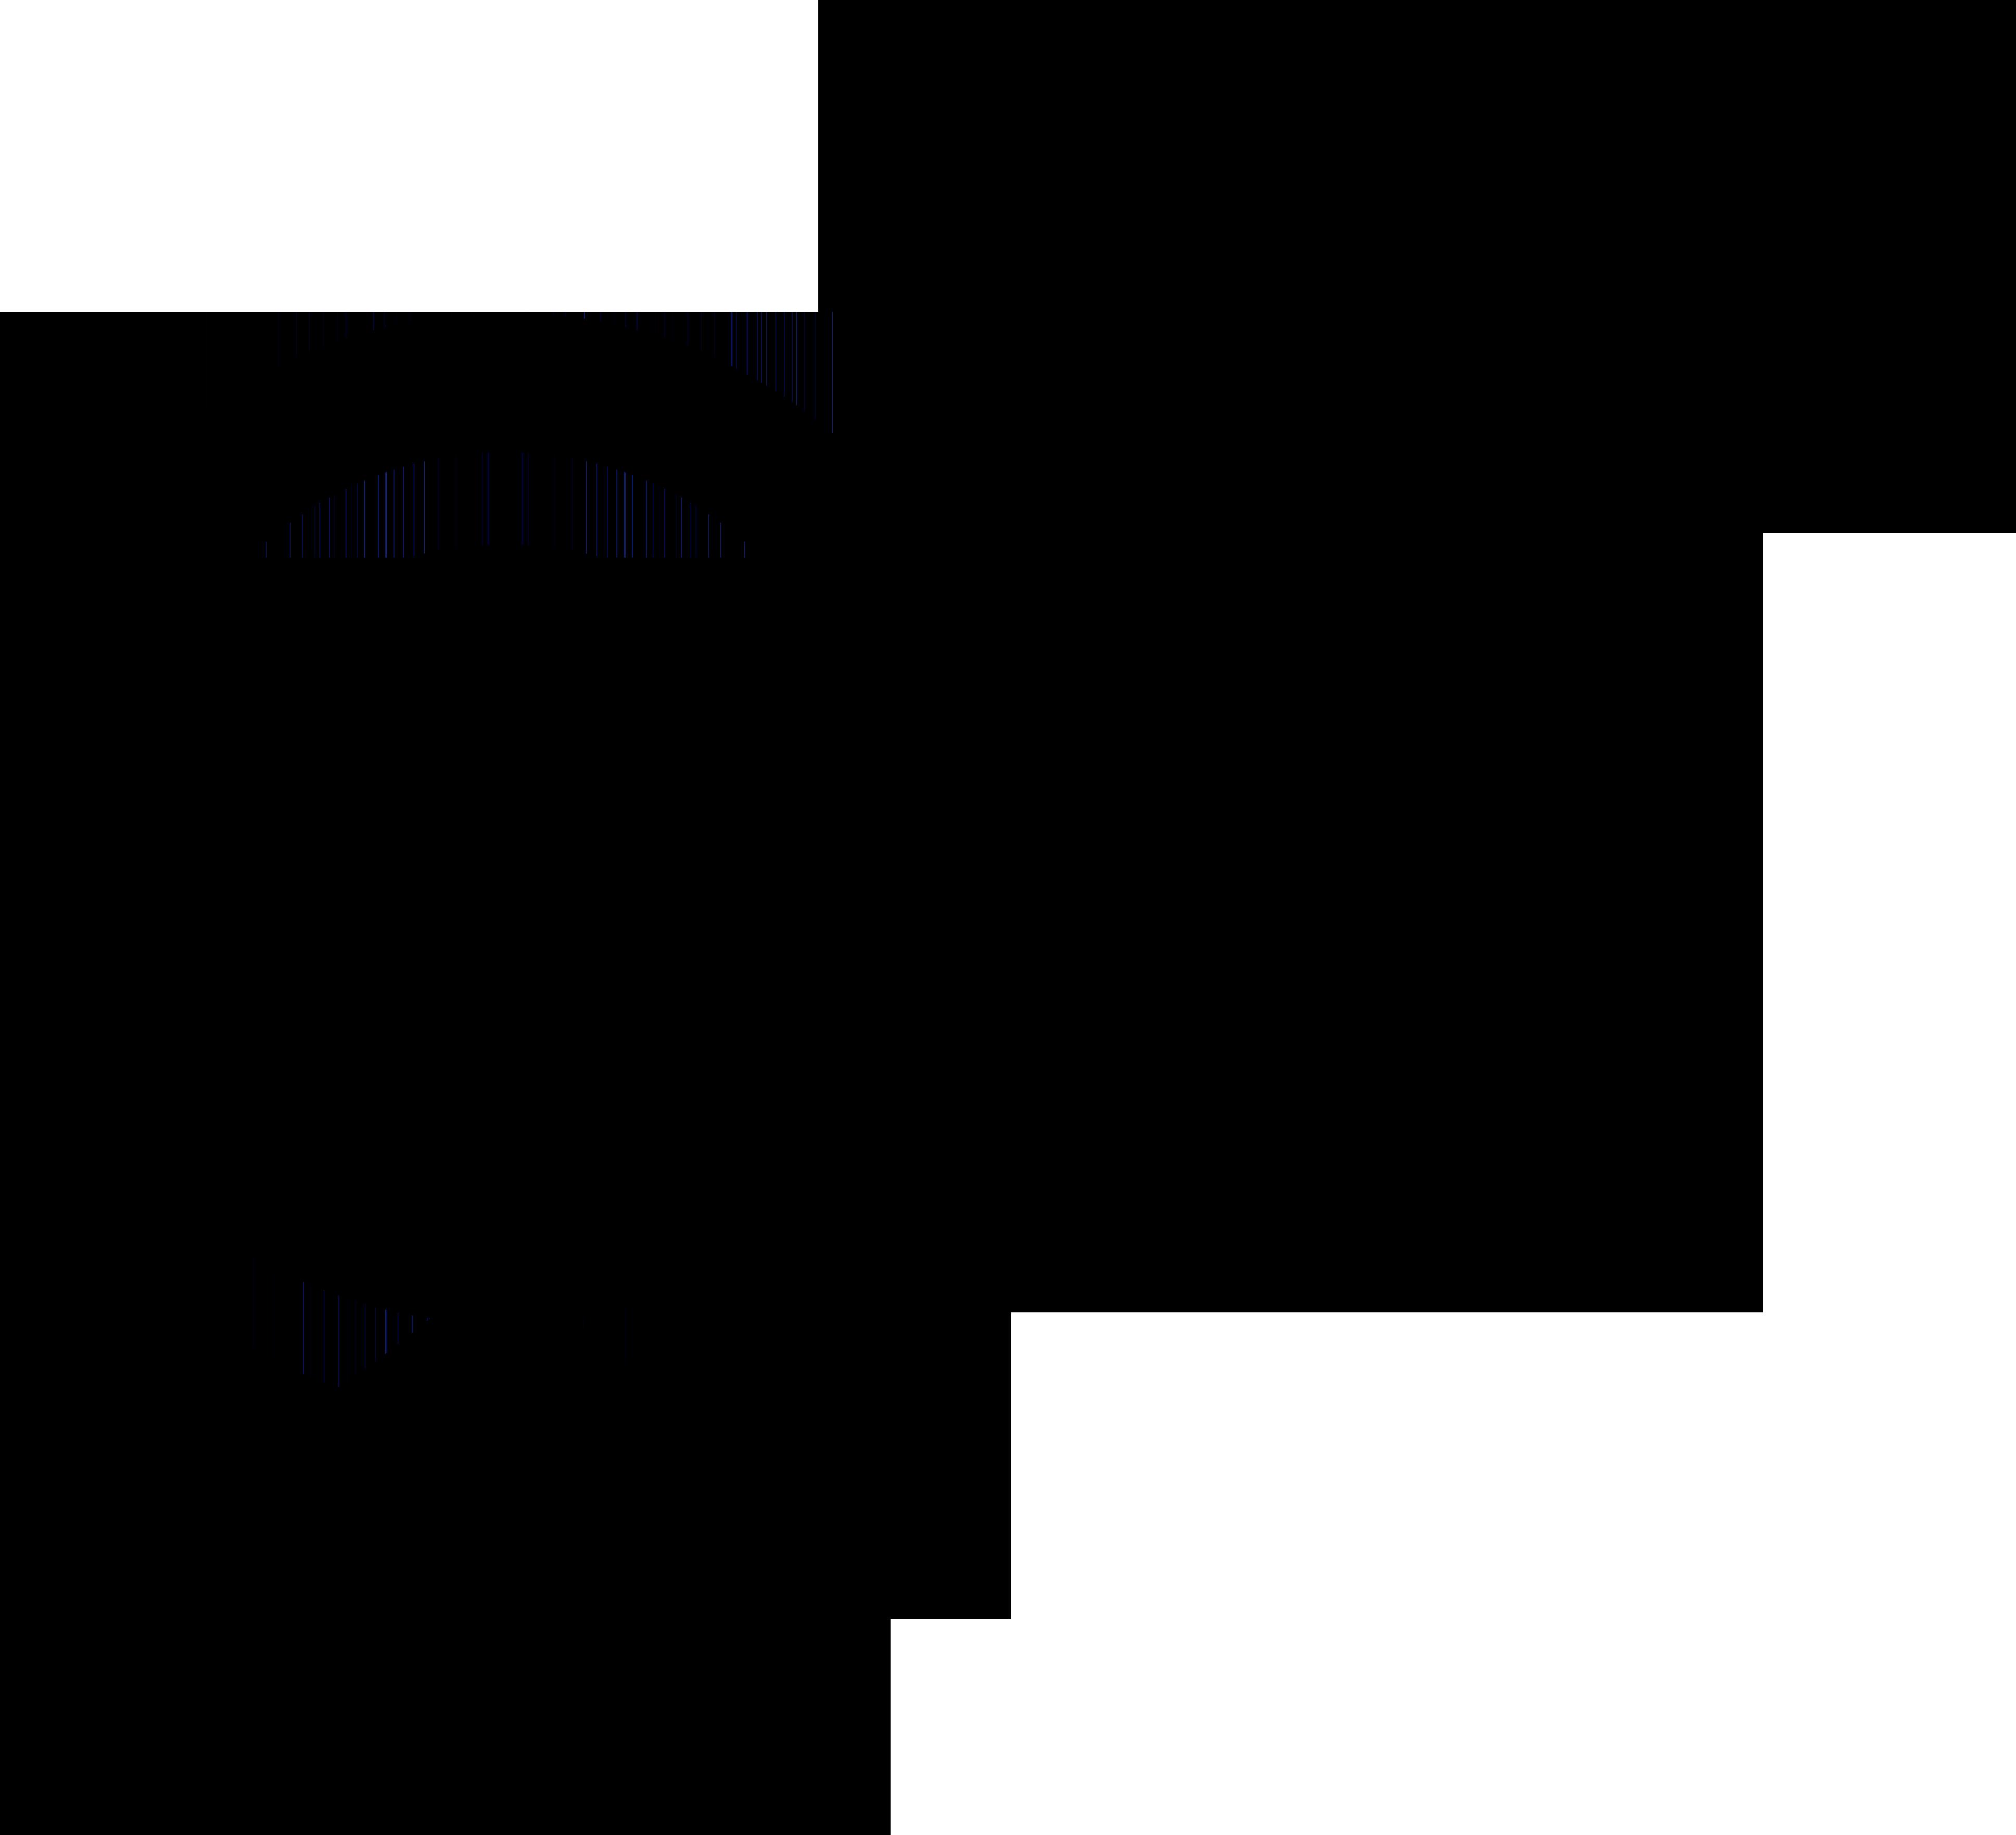 Nonbinary woman symbol interlocked with Mars symbol.